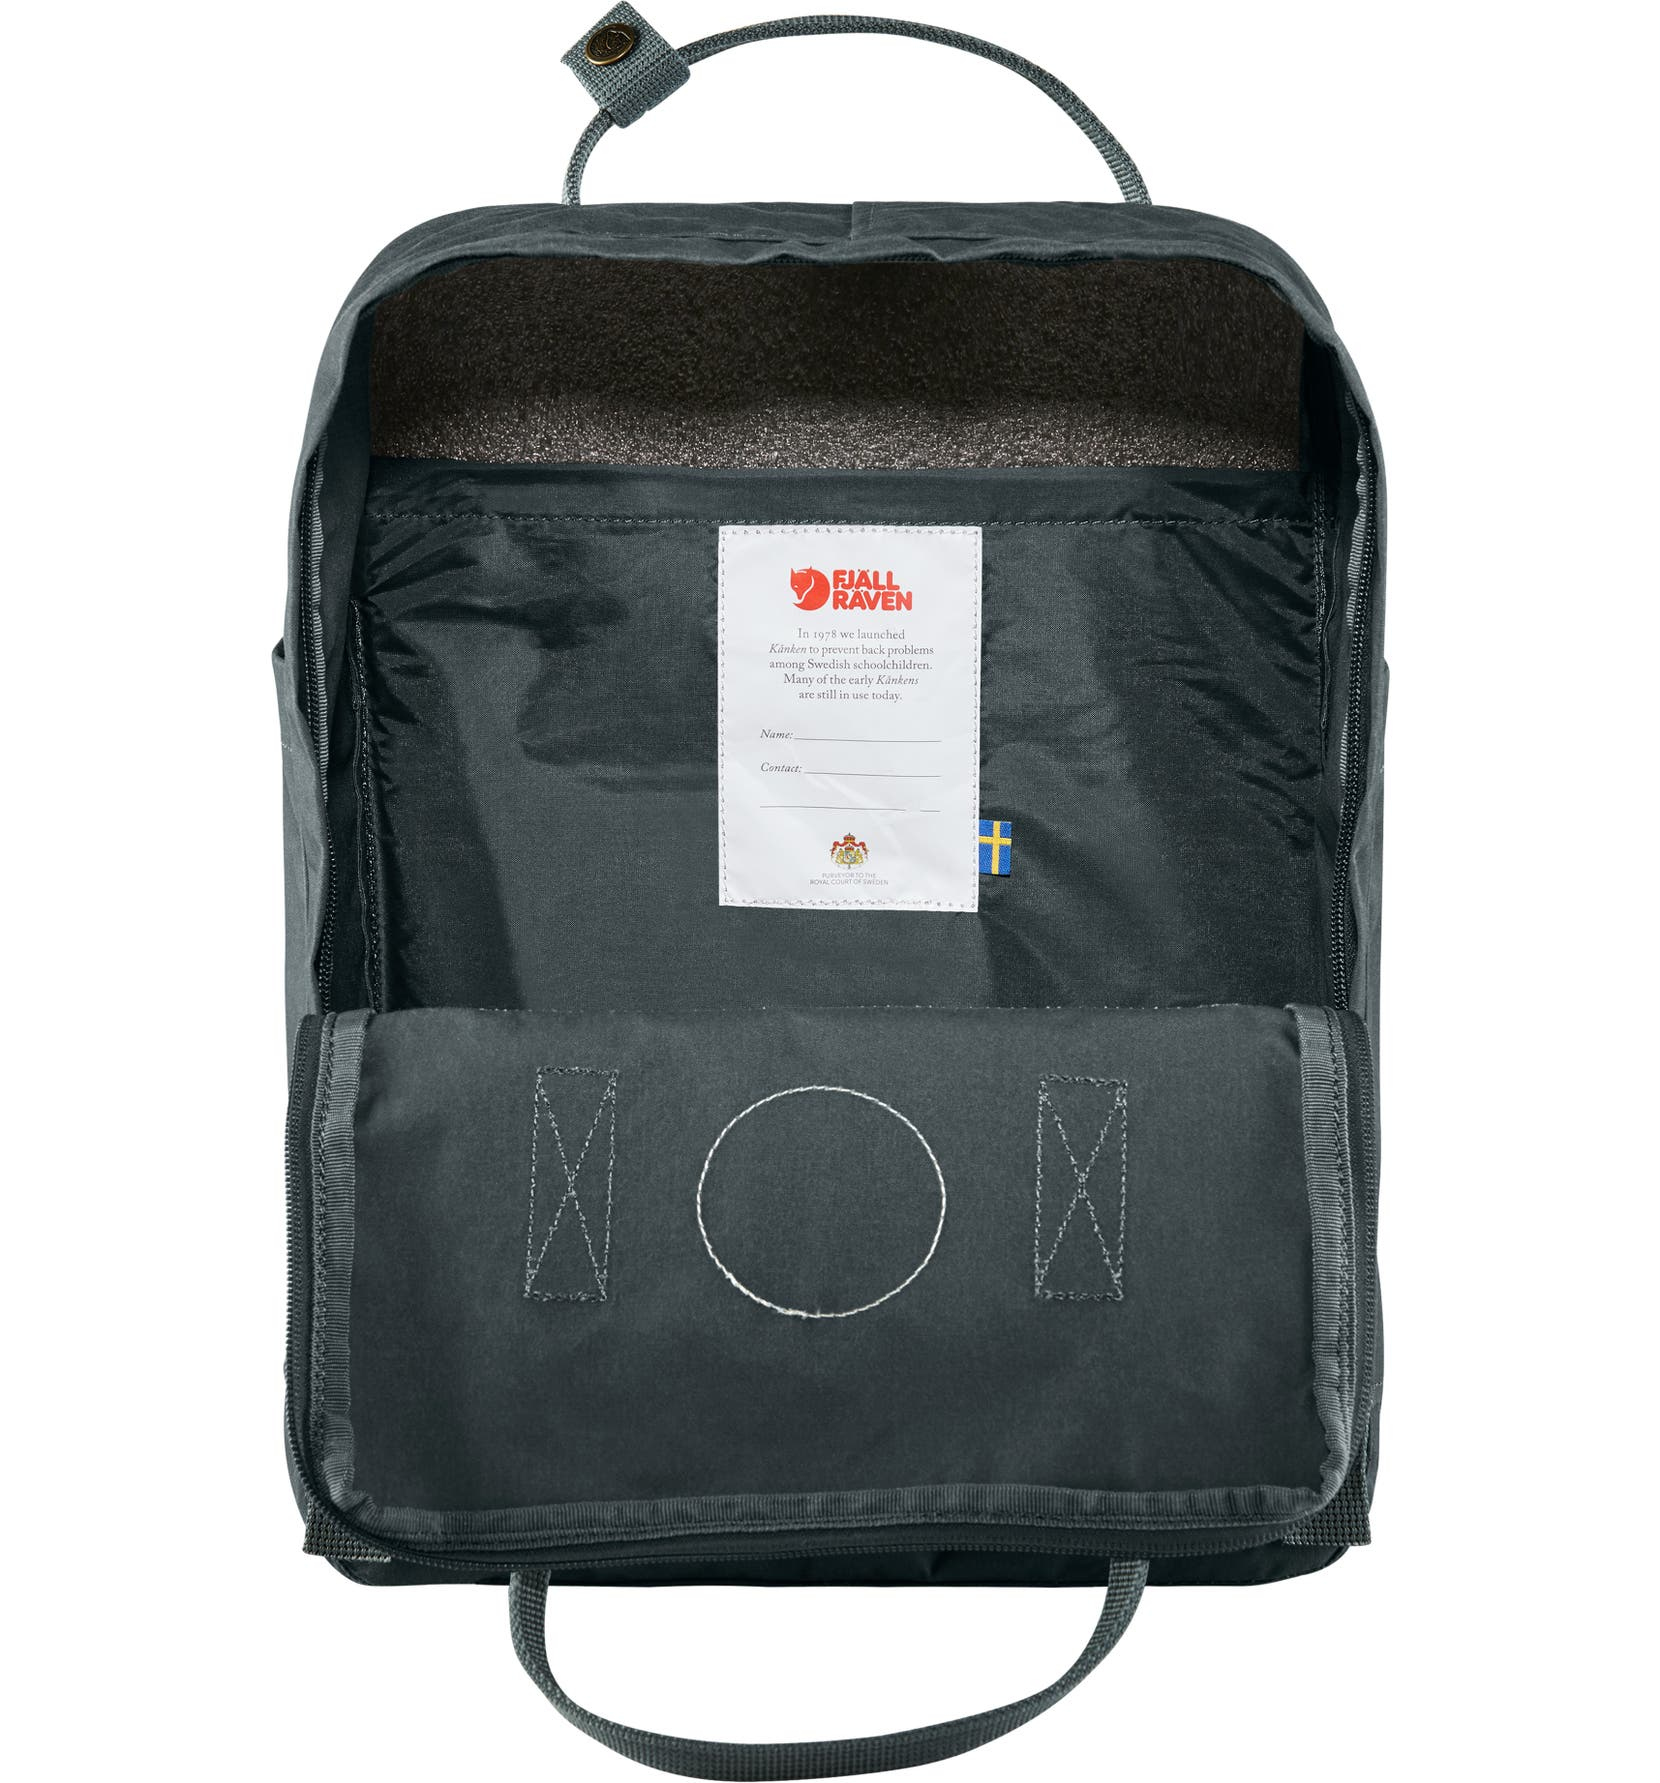 Kånken Water Resistant Backpack